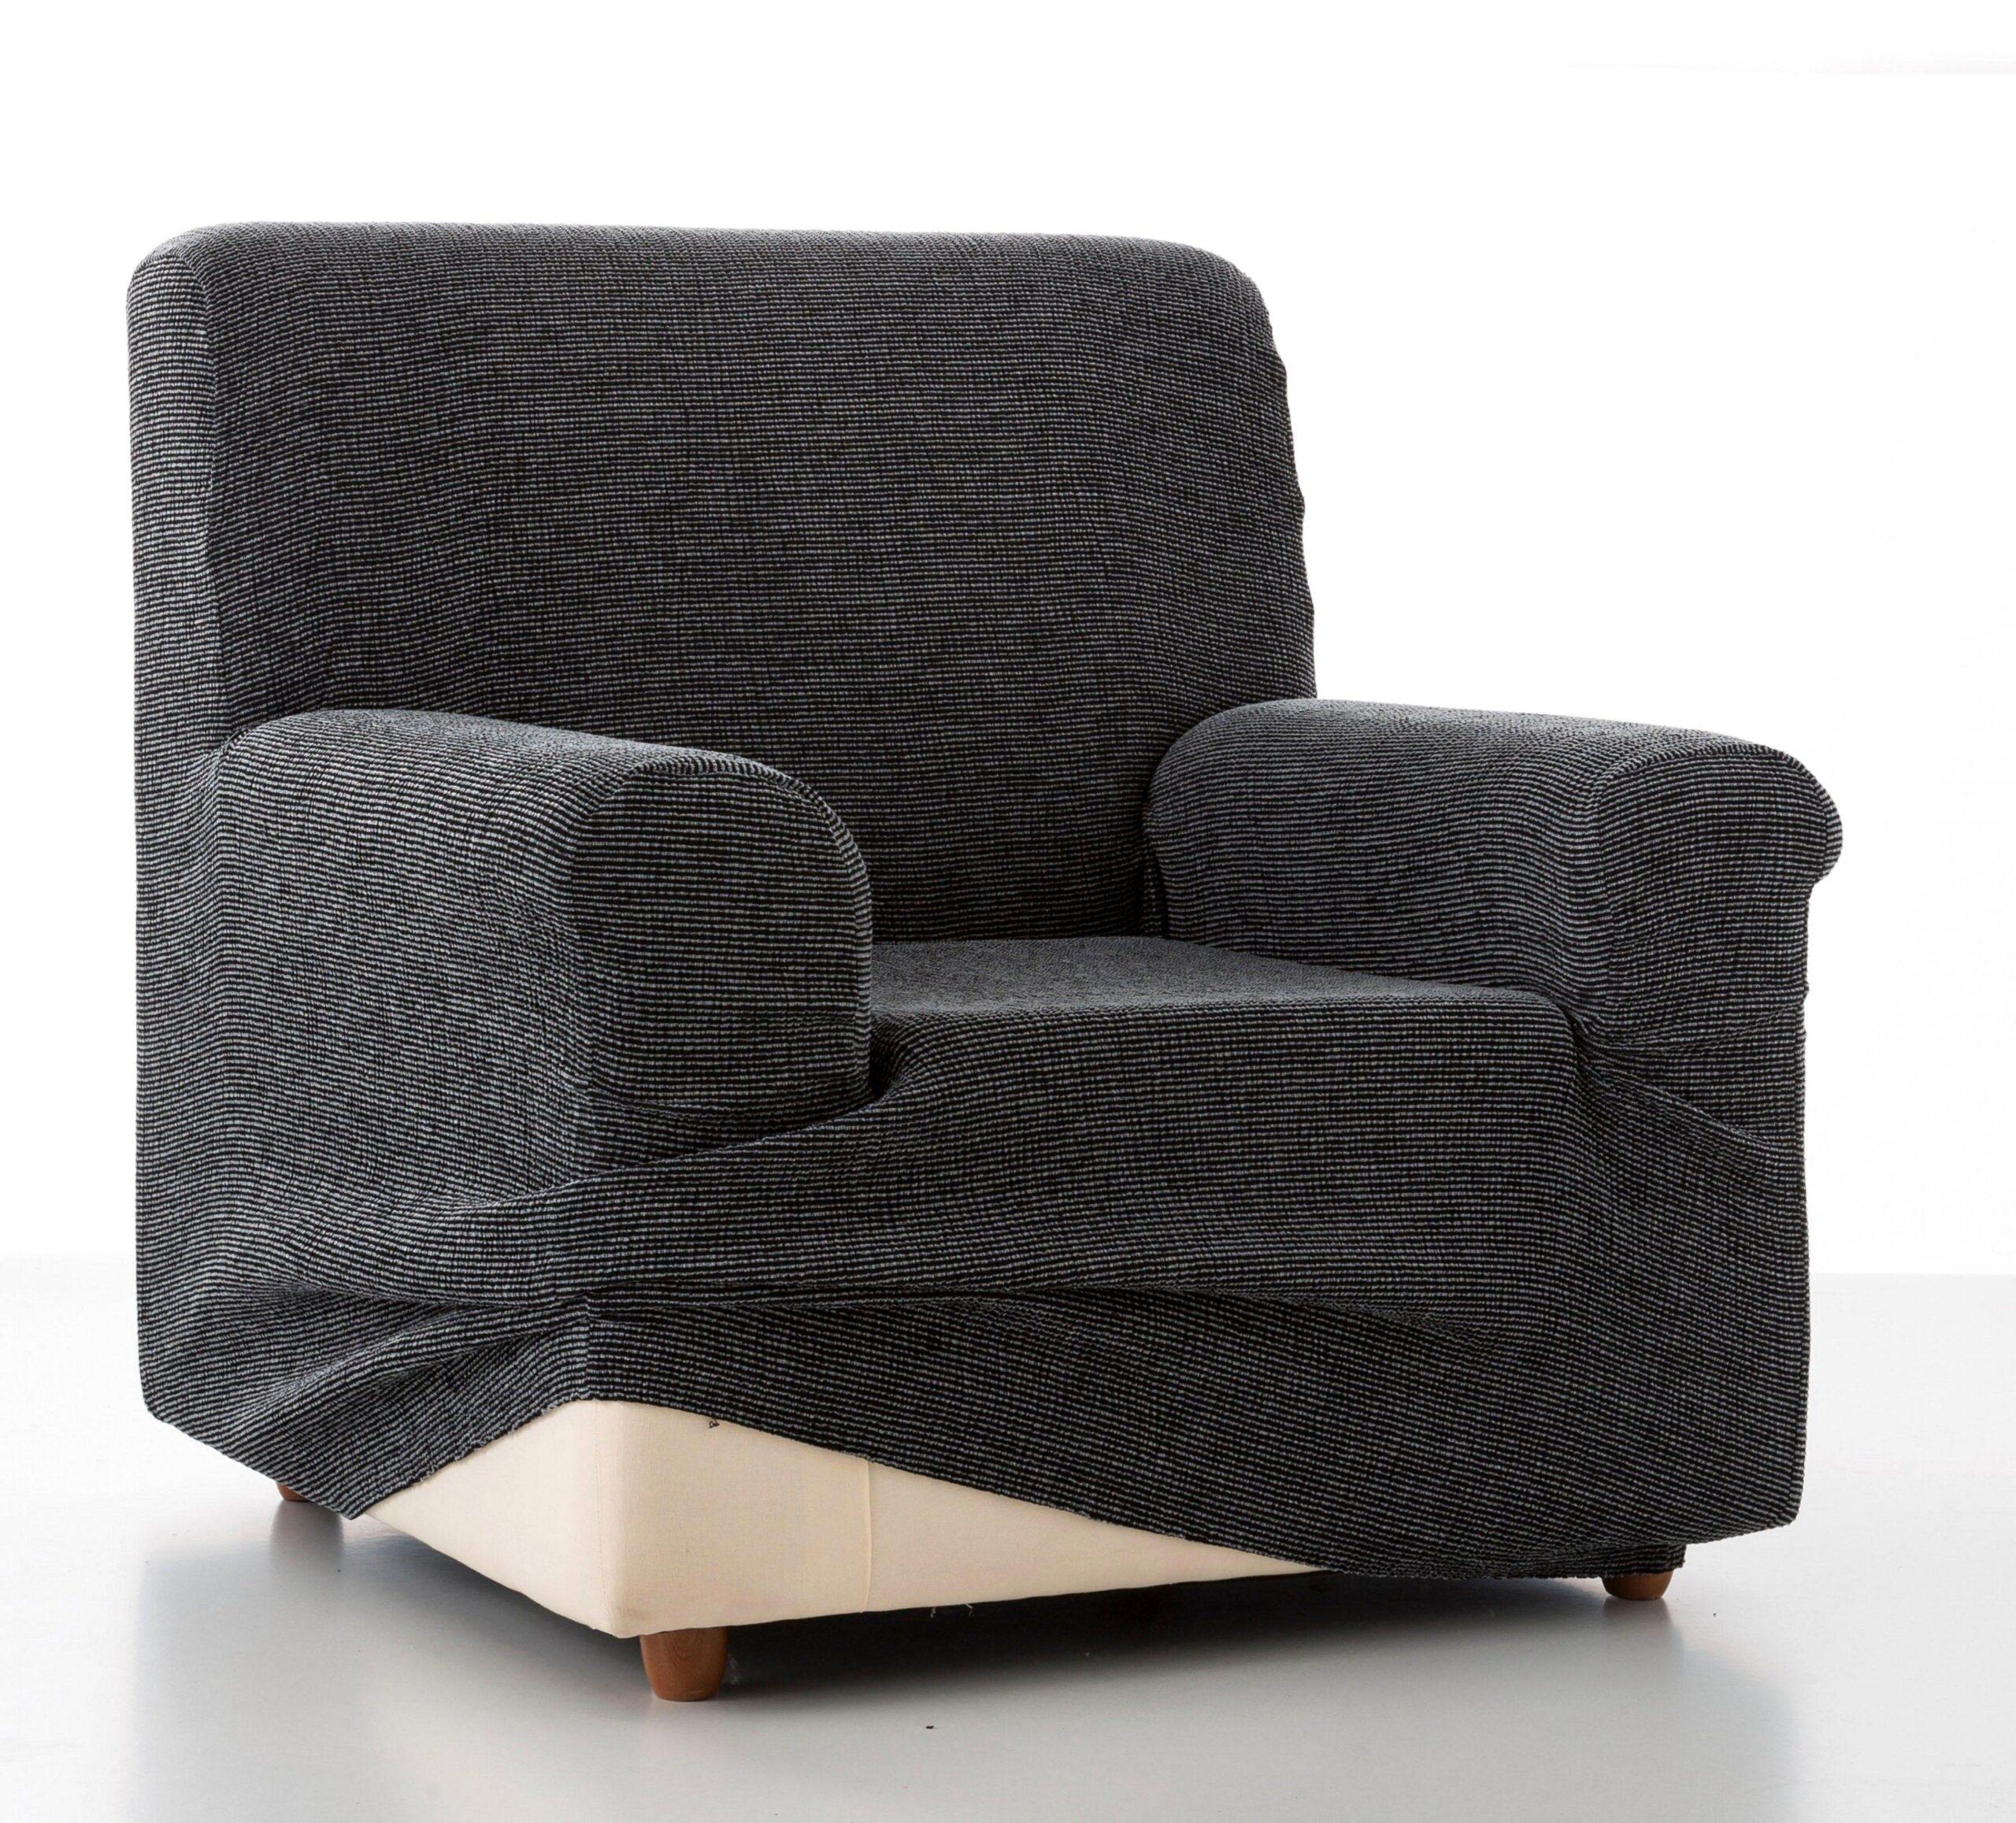 Full Size of Ikea Relaxsessel Mit Hocker Muren Grau Garten Gebraucht Sessel Hussen Fr Good Küche Kaufen Betten 160x200 Kosten Miniküche Aldi Modulküche Bei Sofa Wohnzimmer Ikea Relaxsessel